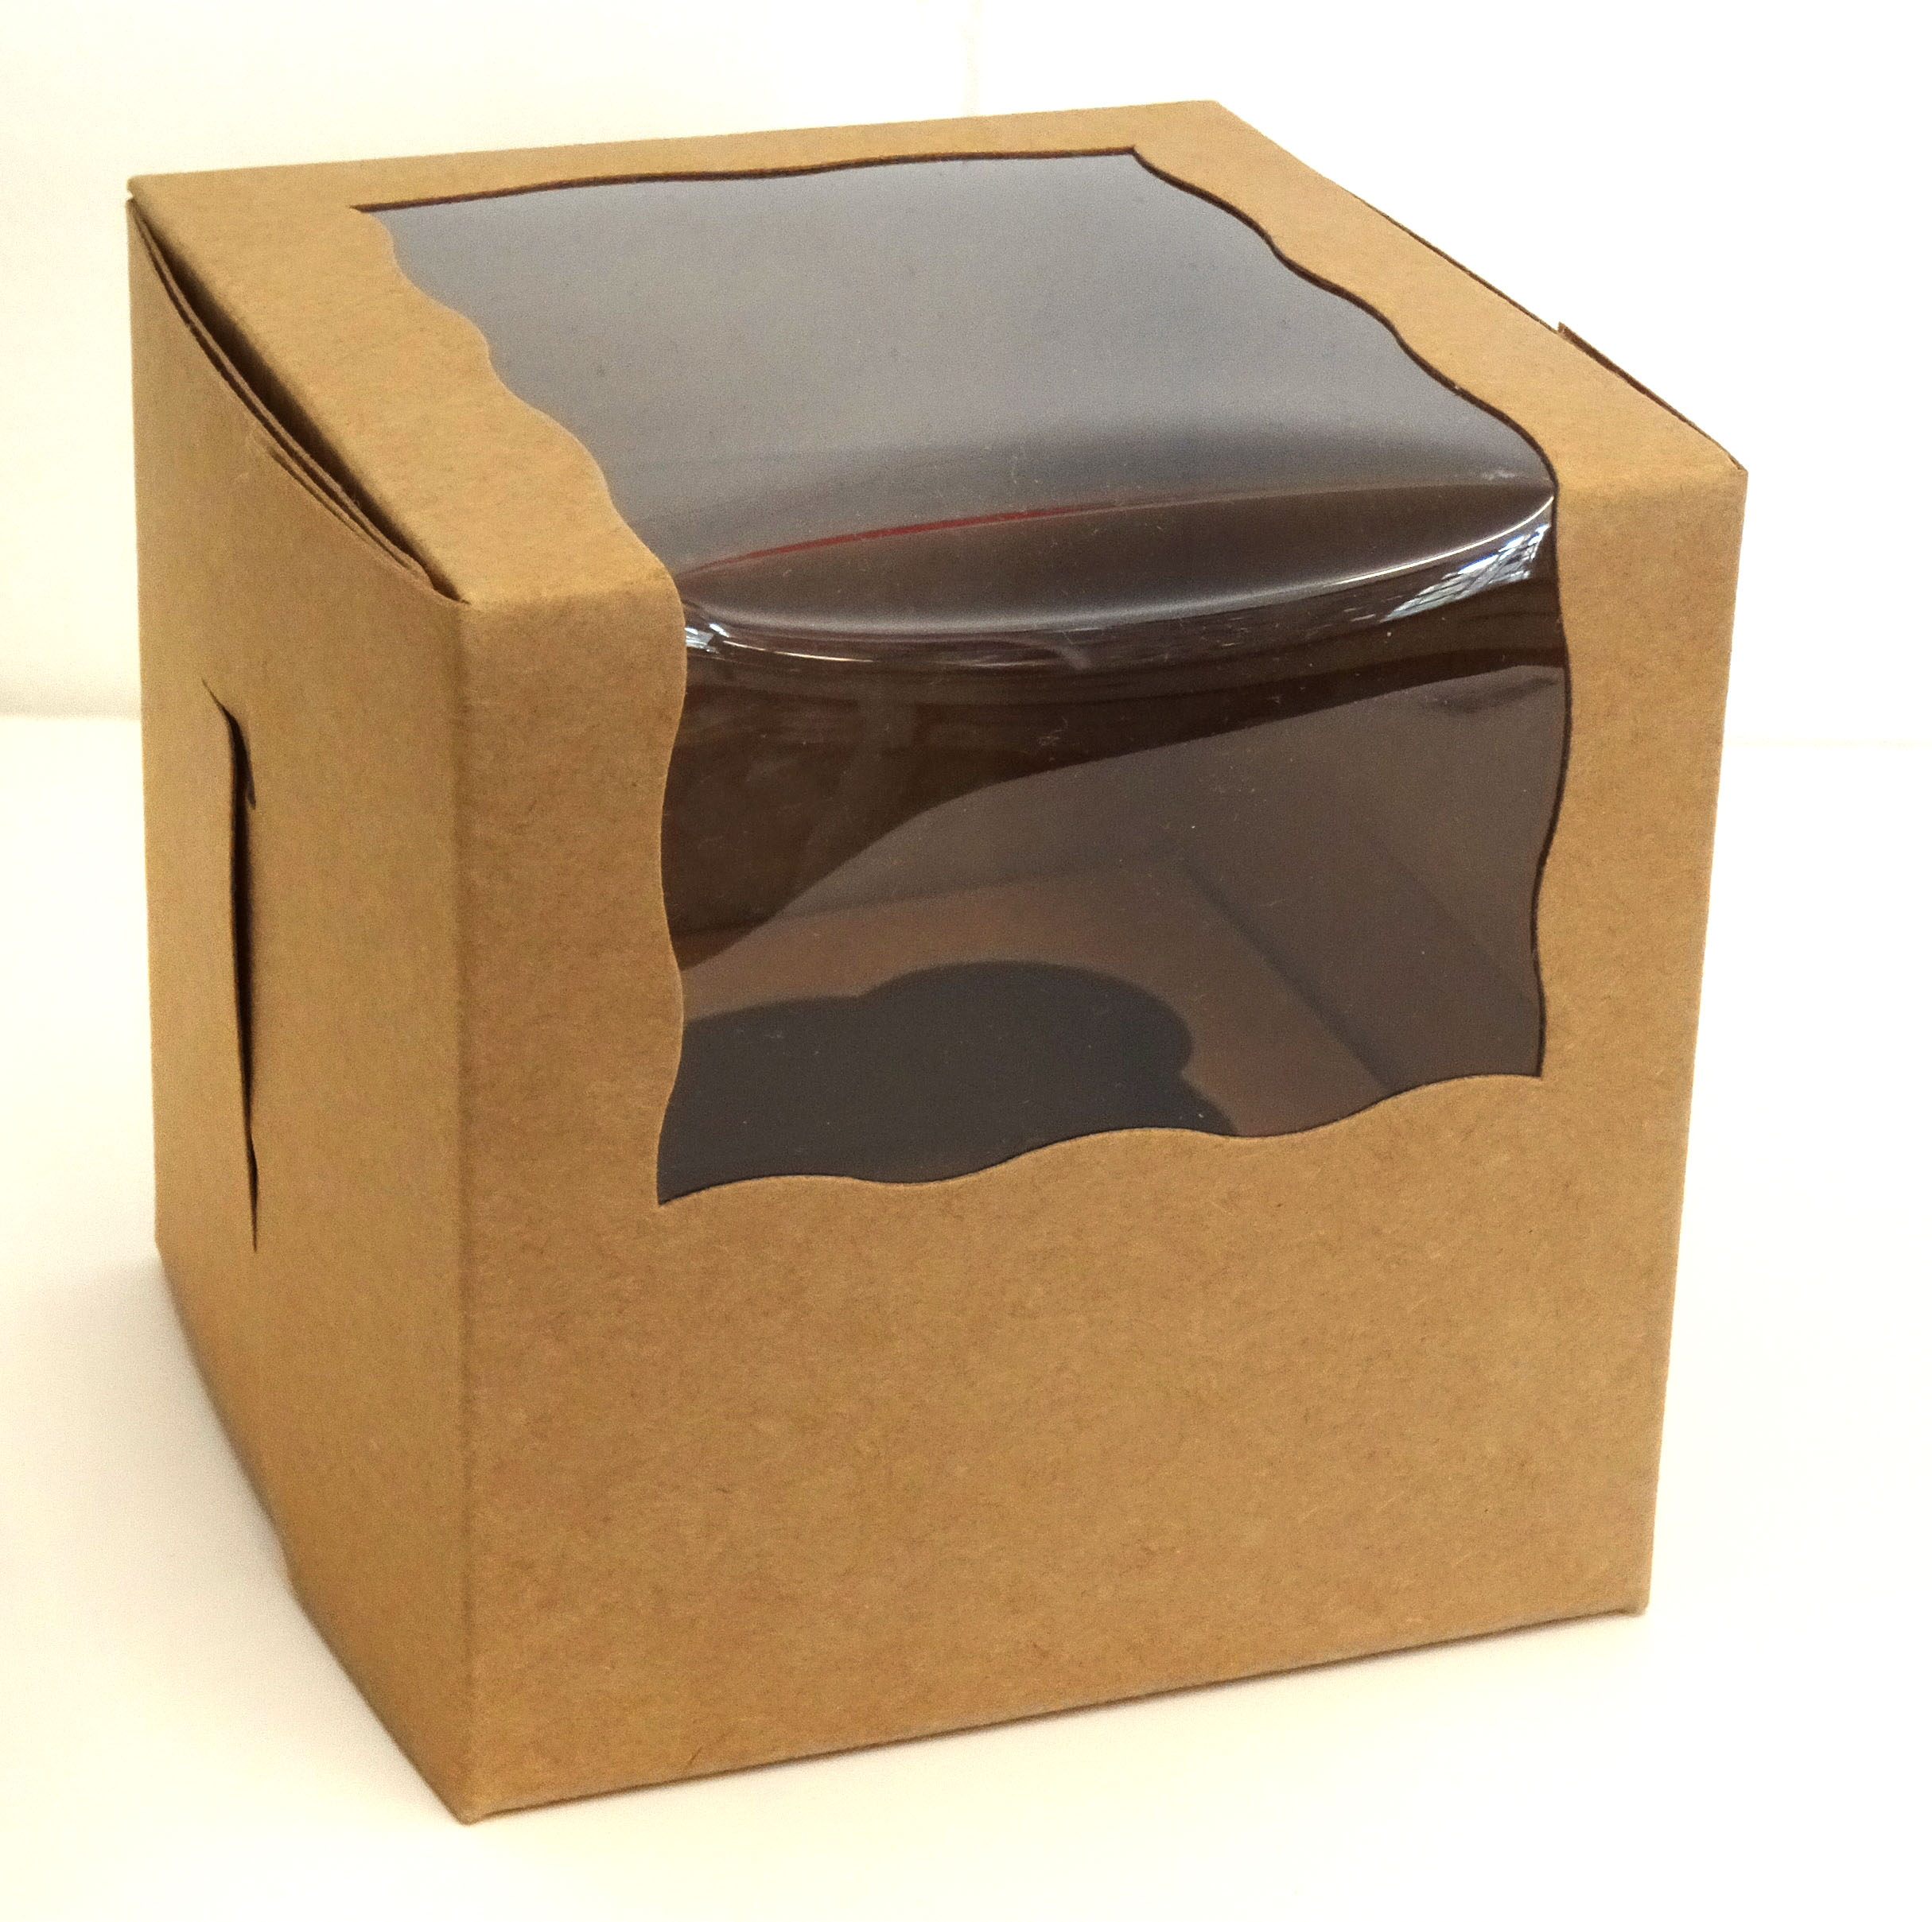 Bake A Cake Single Cupcake Muffin Box Kraft Brown